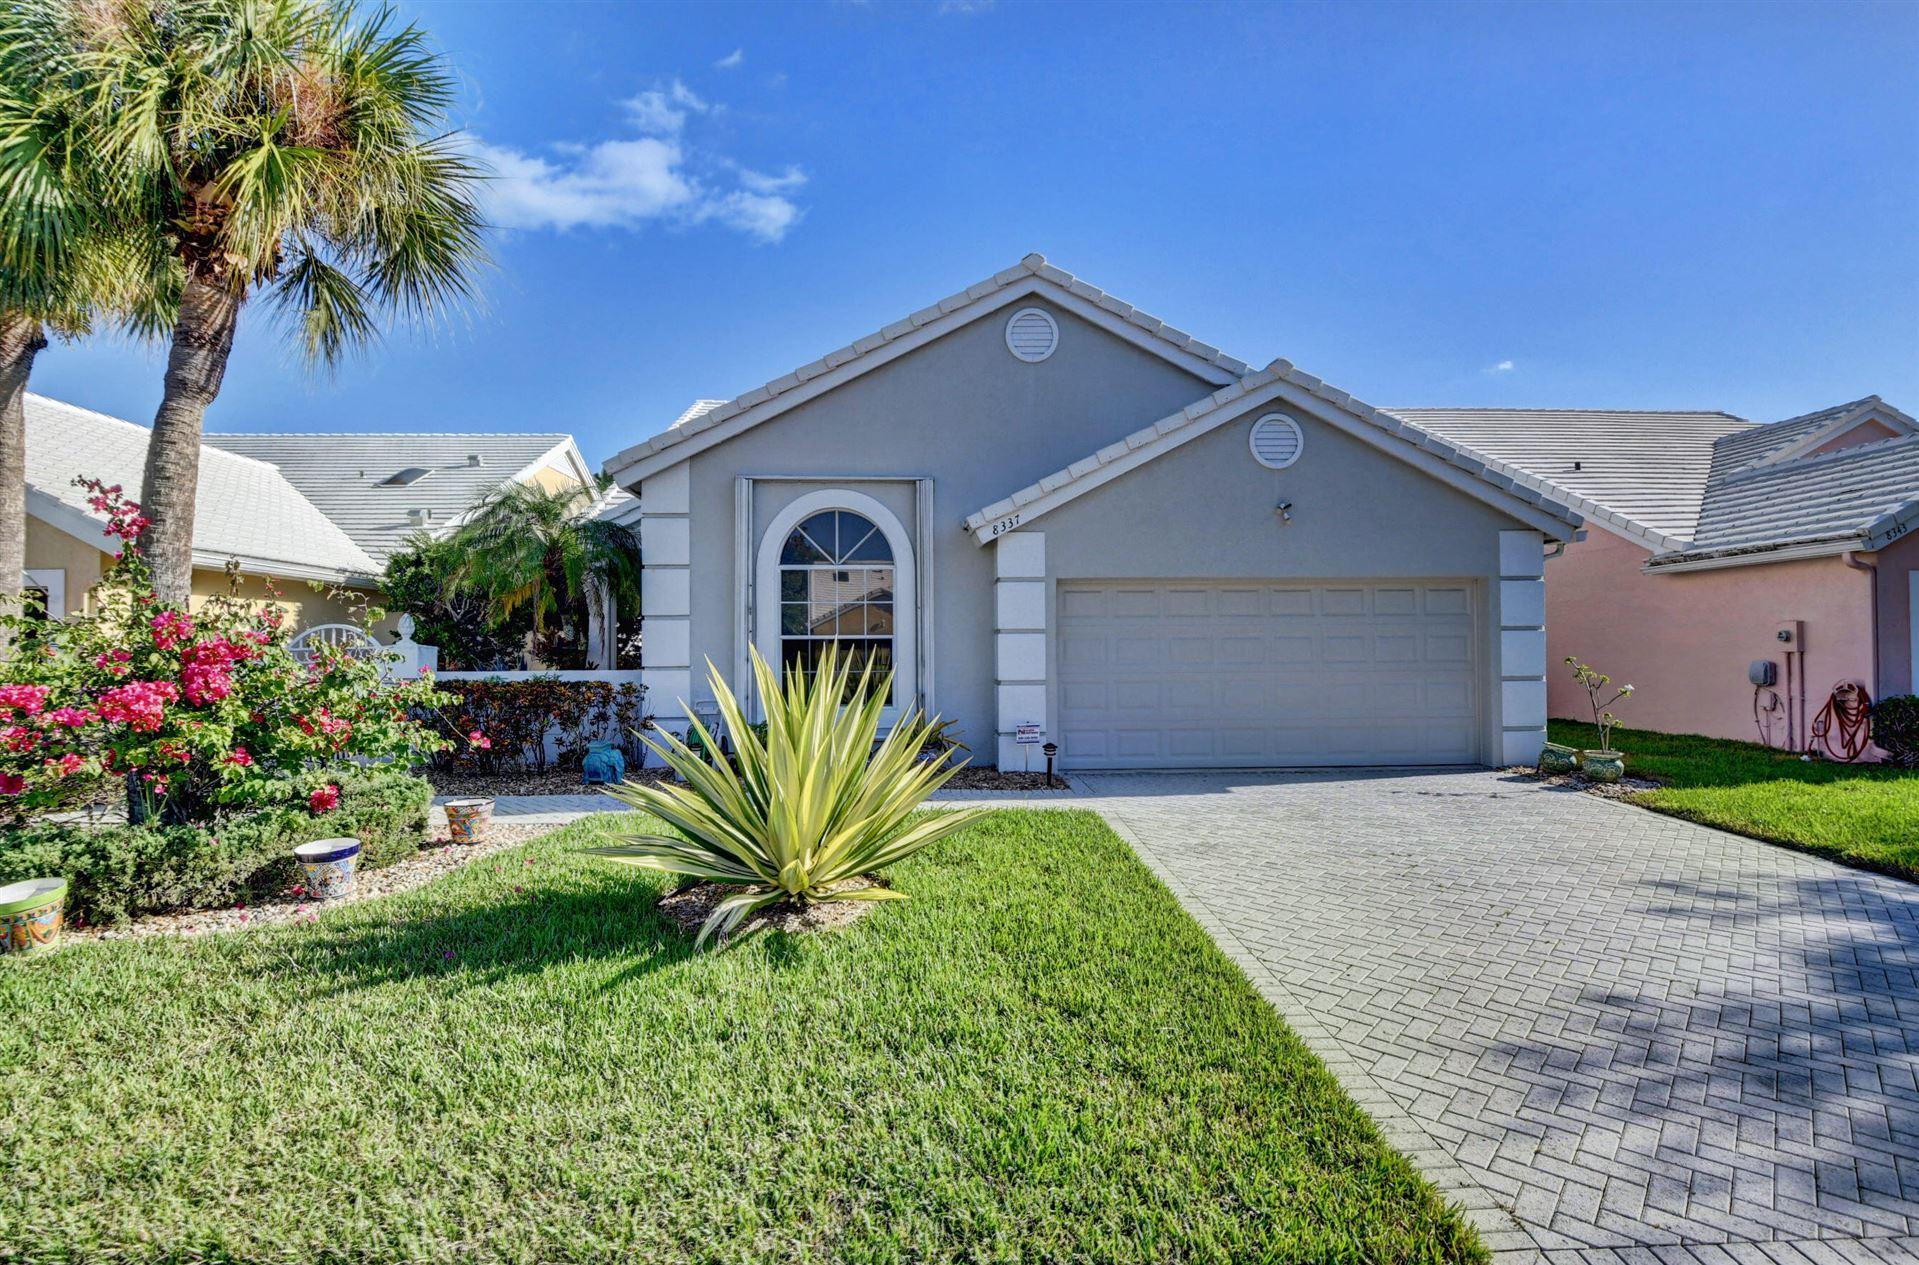 8337 Horseshoe Bay Road, Boynton Beach, FL 33472 - MLS#: RX-10753639